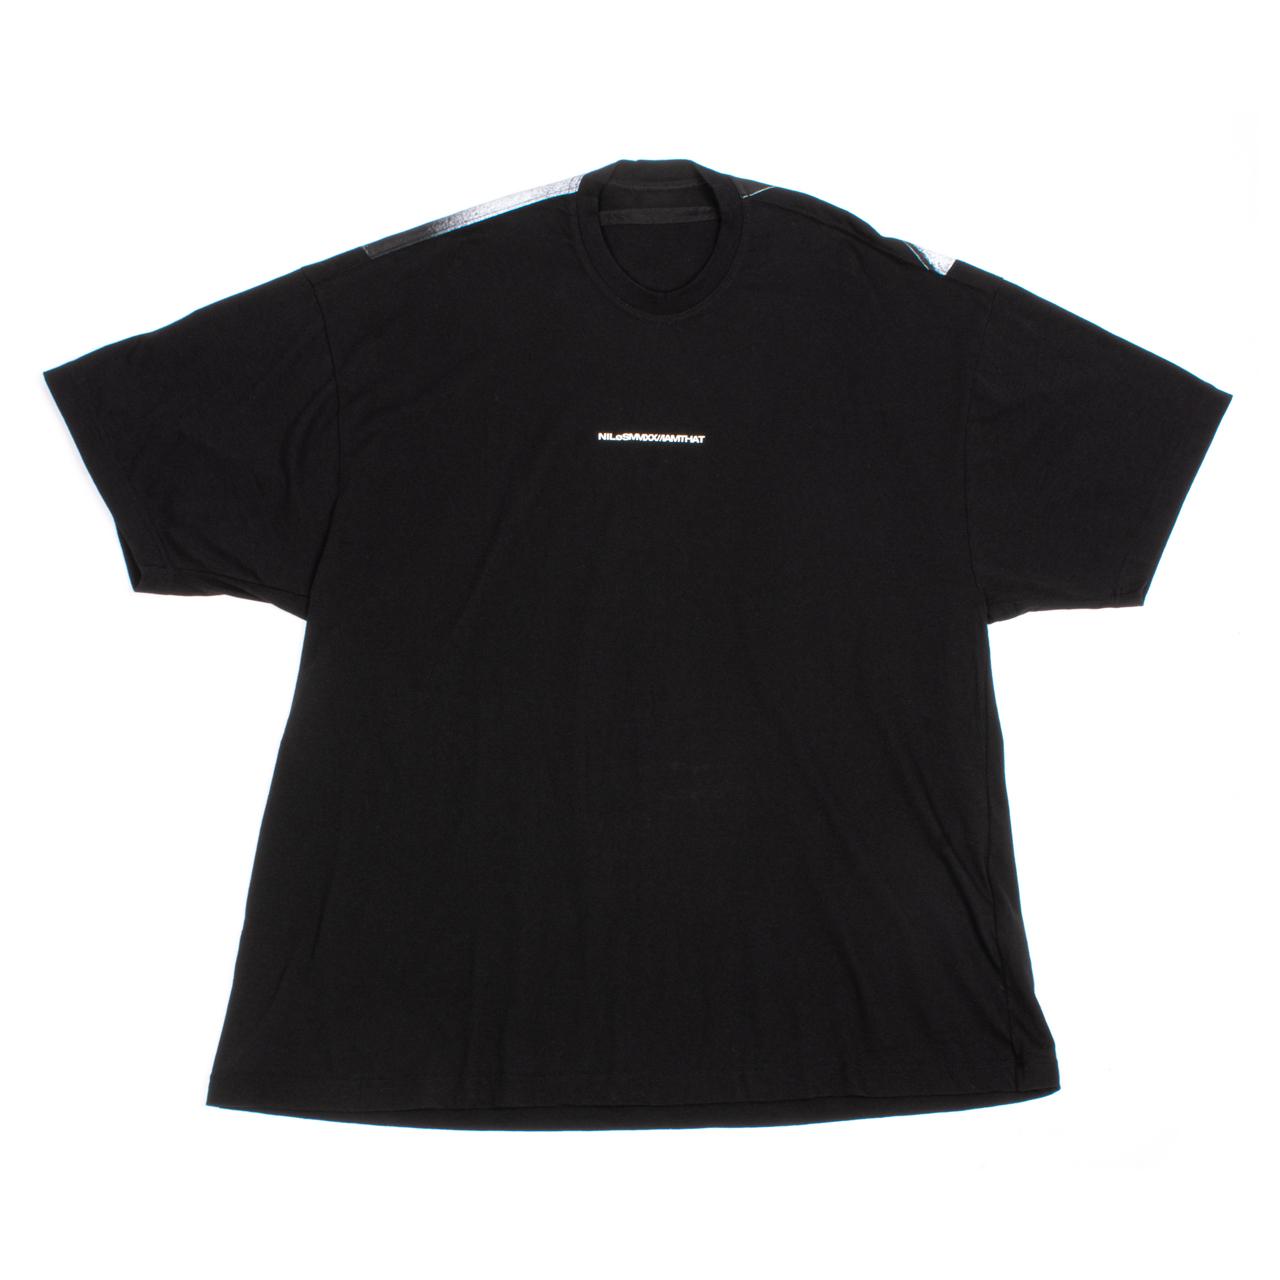 720CPM5-BLACK / オーバーサイズ バックプリント Tシャツ